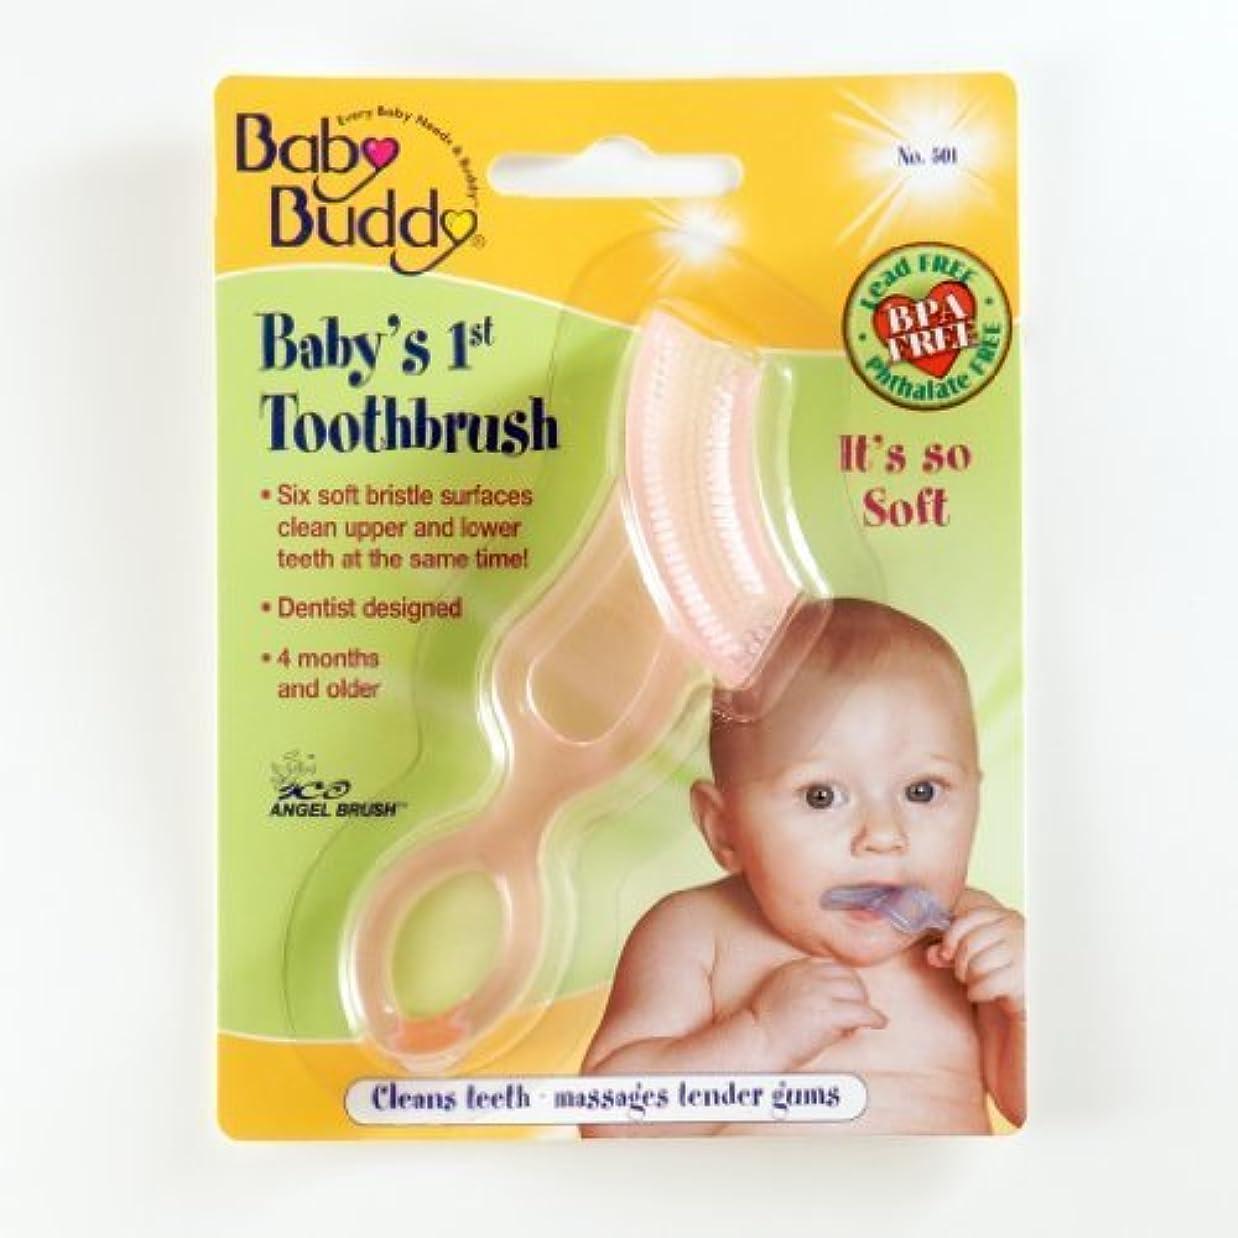 Baby Buddy: Baby's 1st Toothbrush by Baby Buddy [並行輸入品]